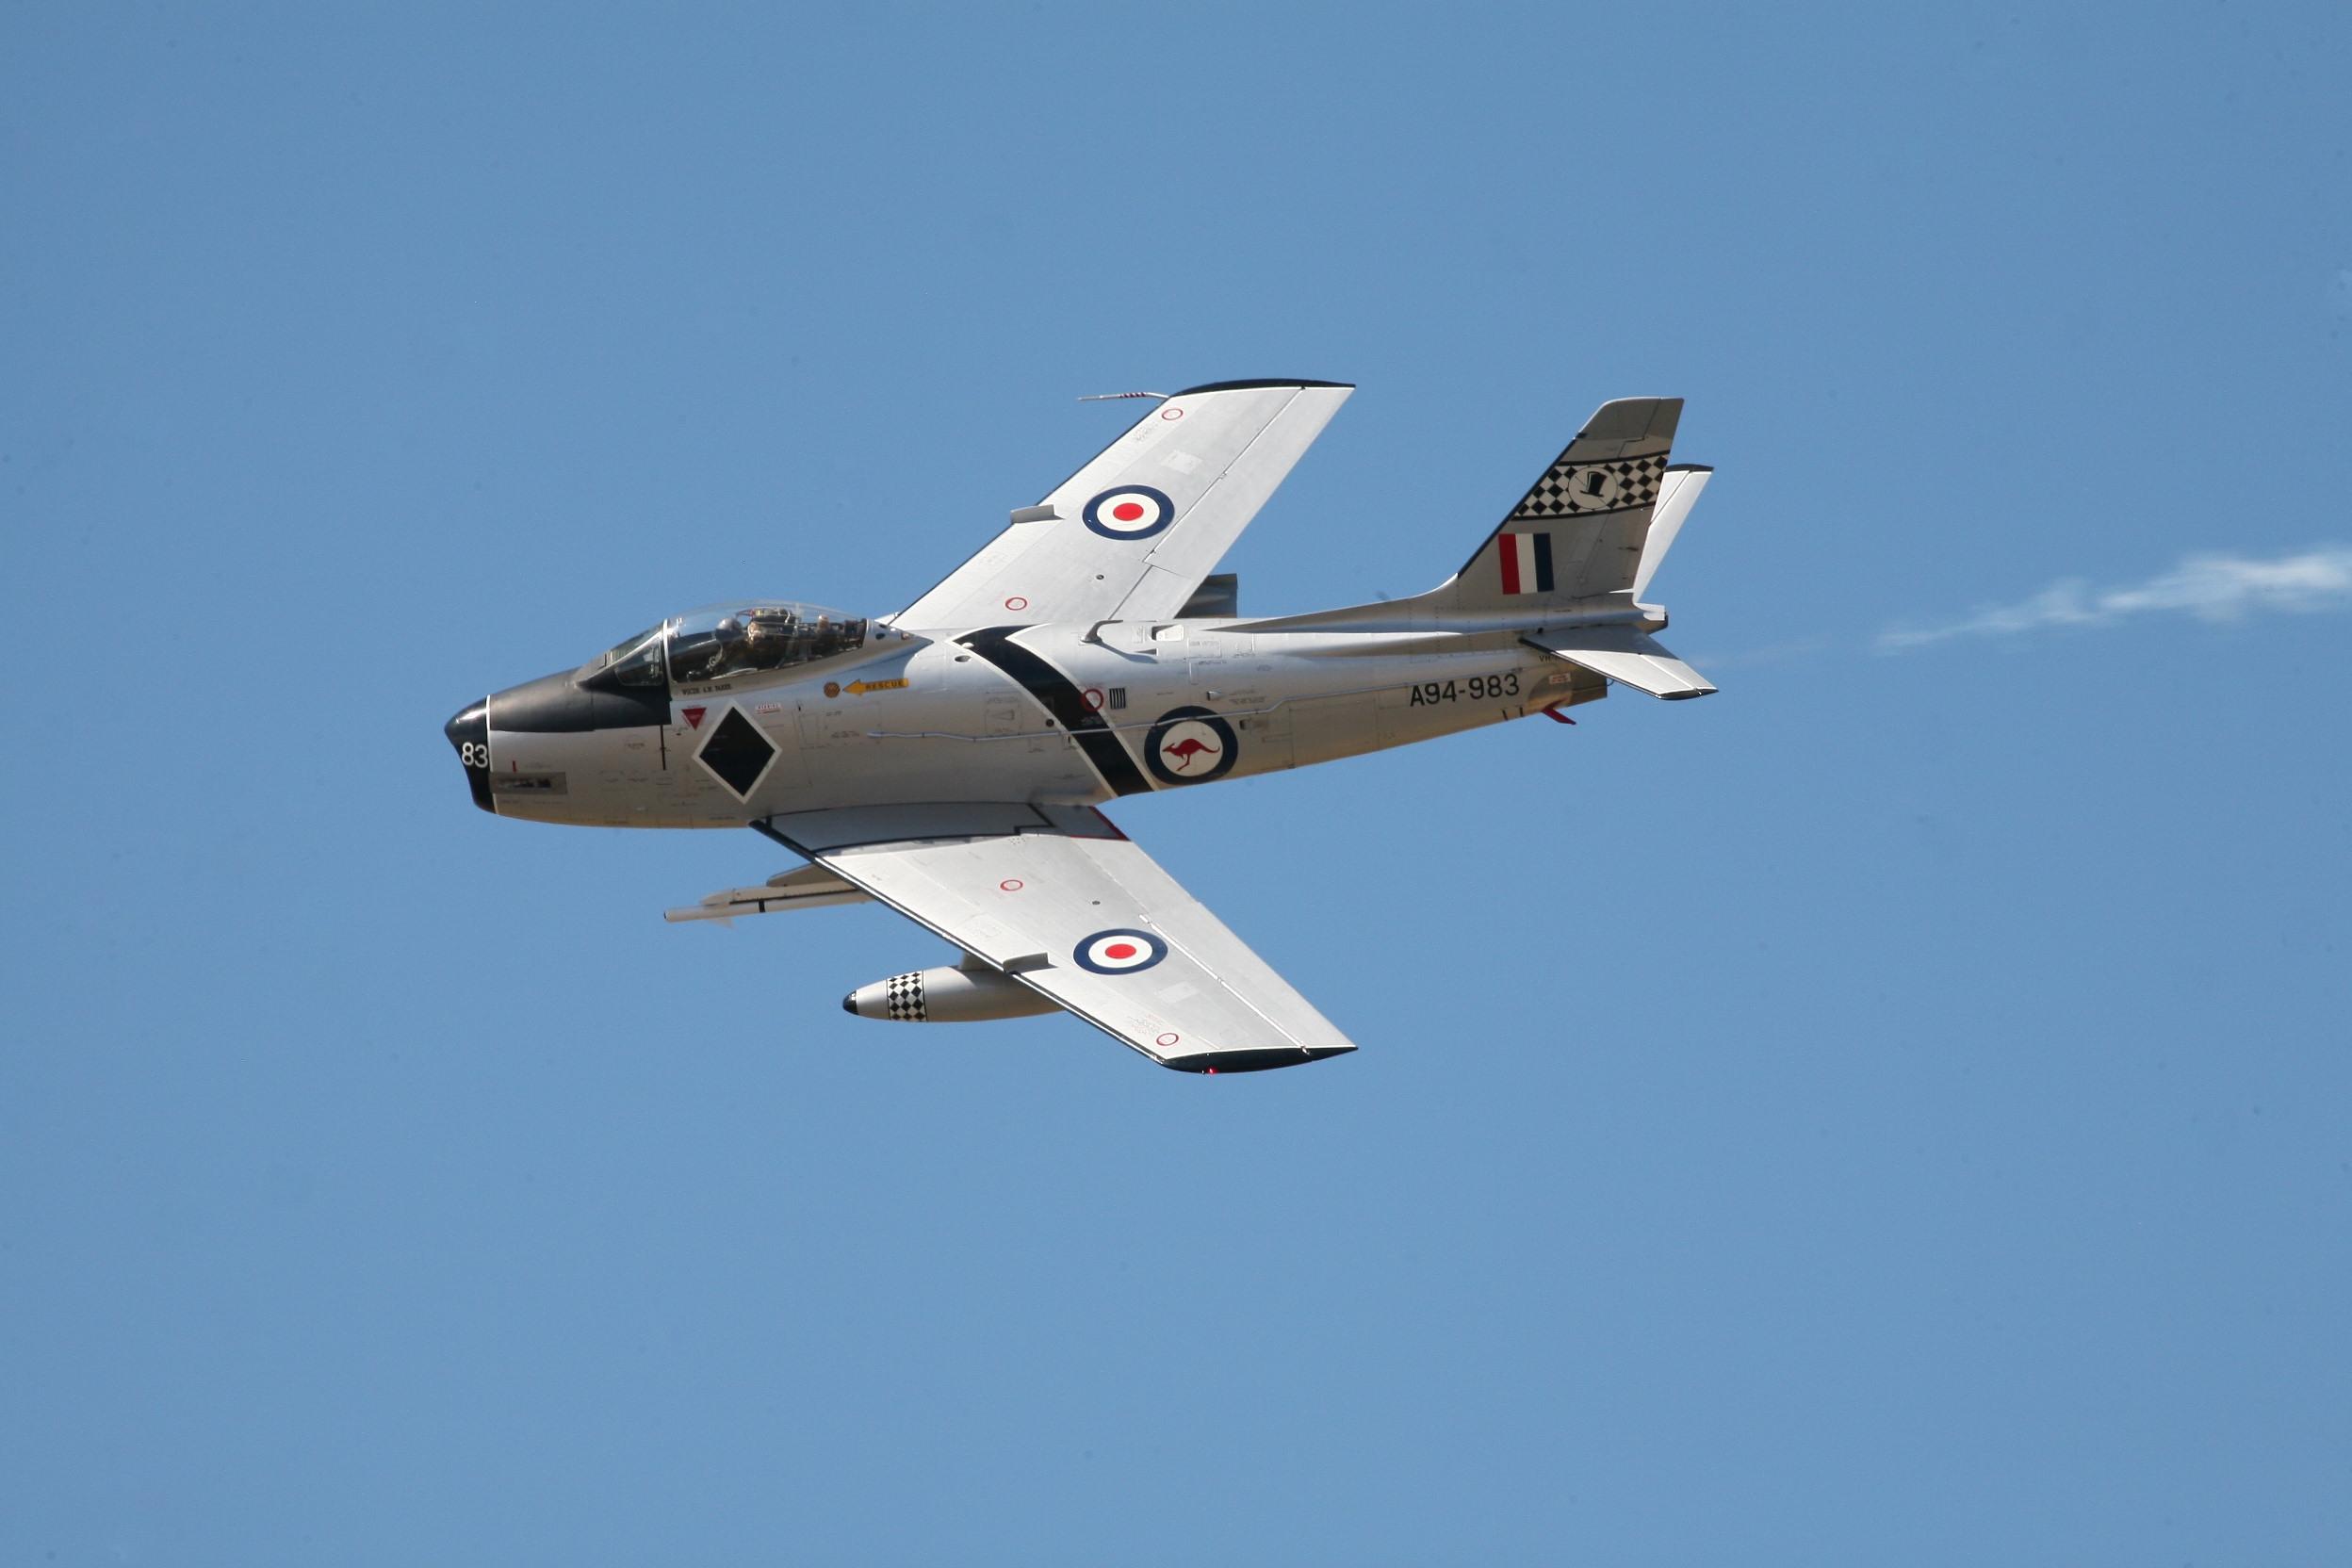 Temora Aviation Museum CAC-27 Sabre Mk. 32 jet 1960s markings